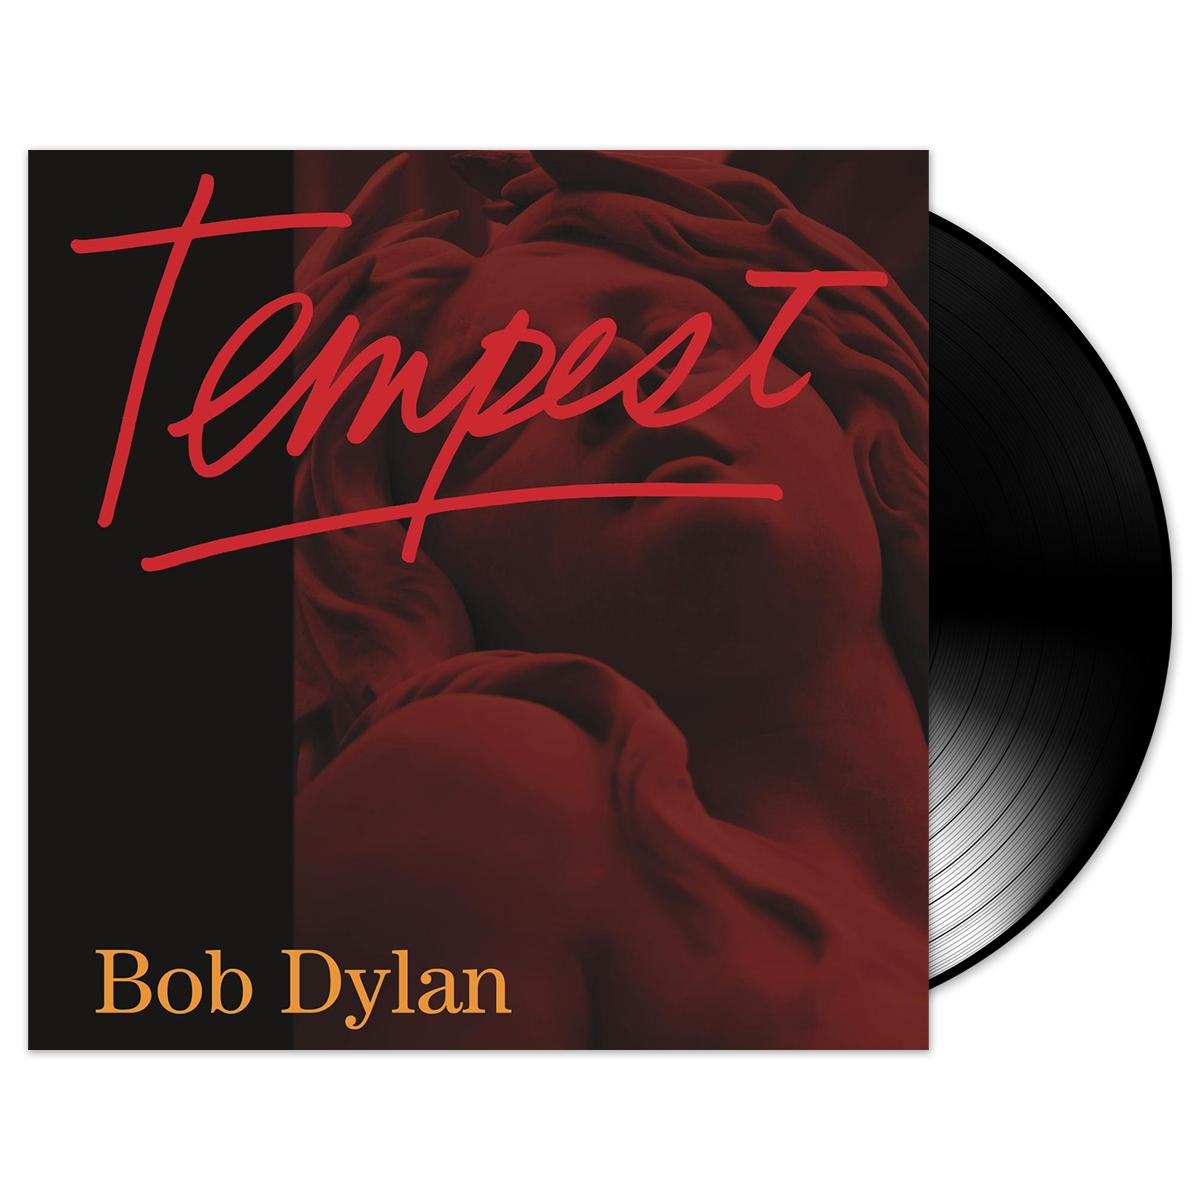 Tempest LP Vinyl